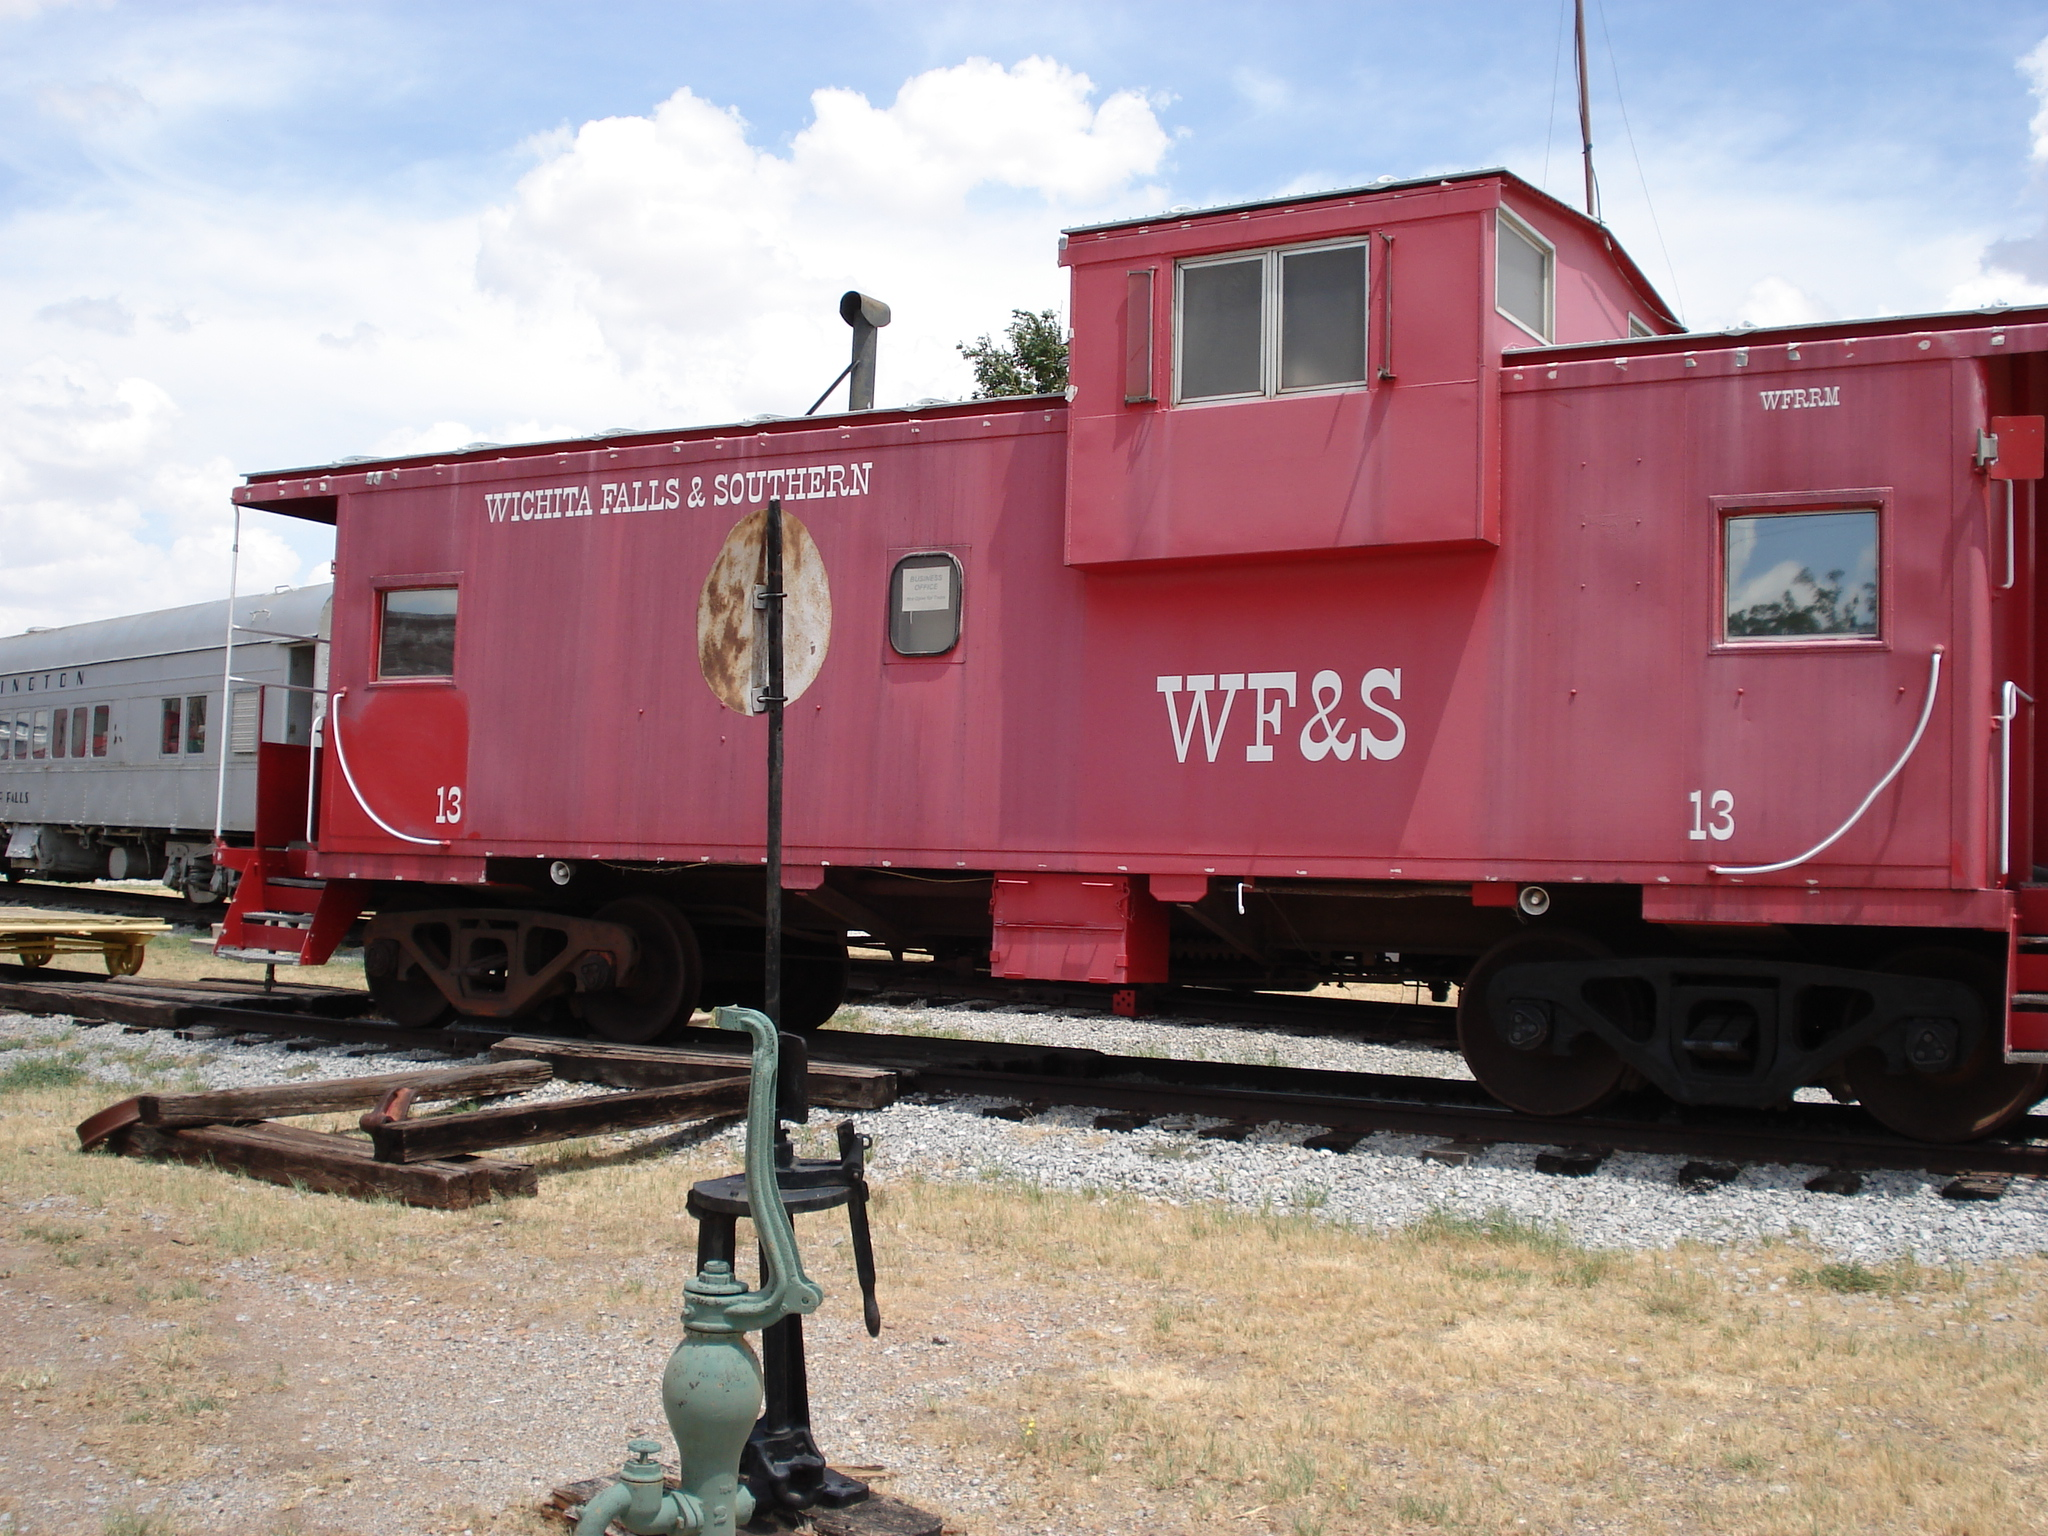 Wichita Falls and South Railroad Car